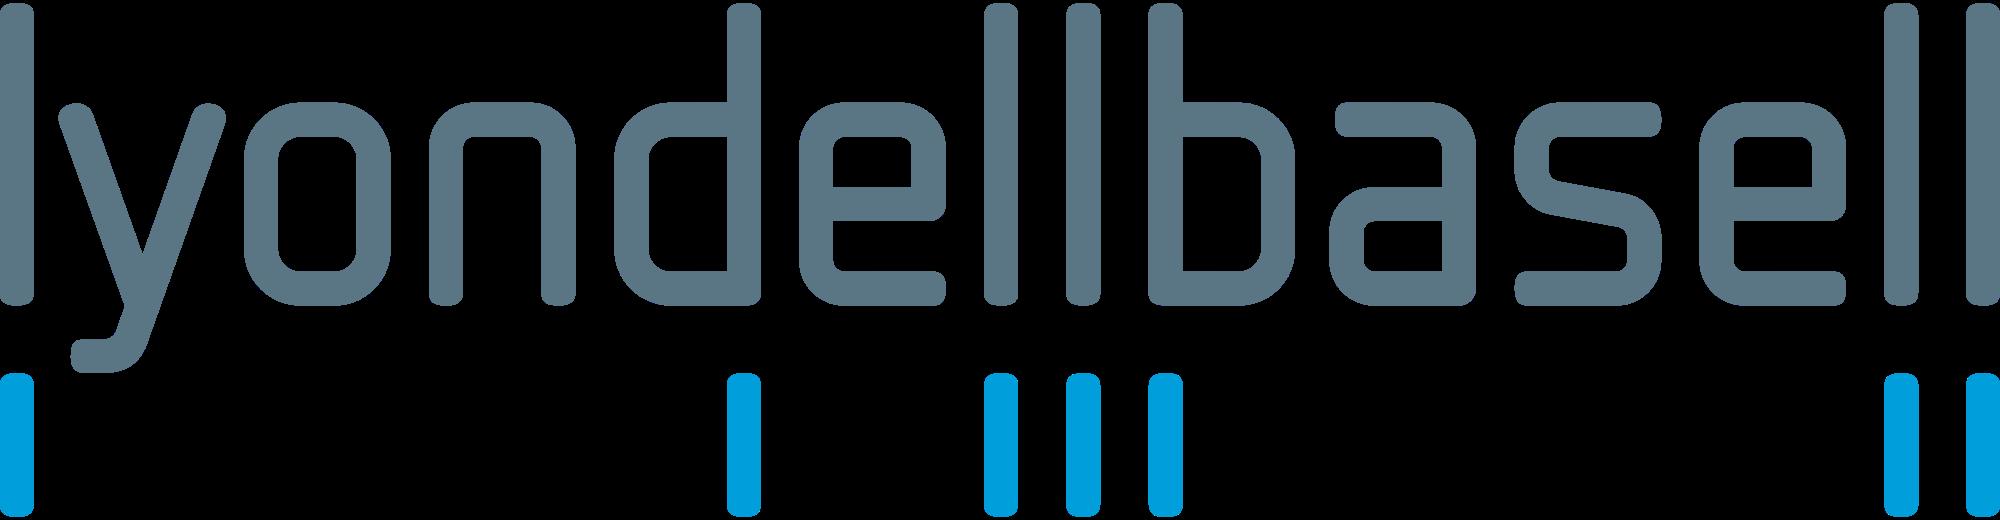 Lyondellbasell_logo